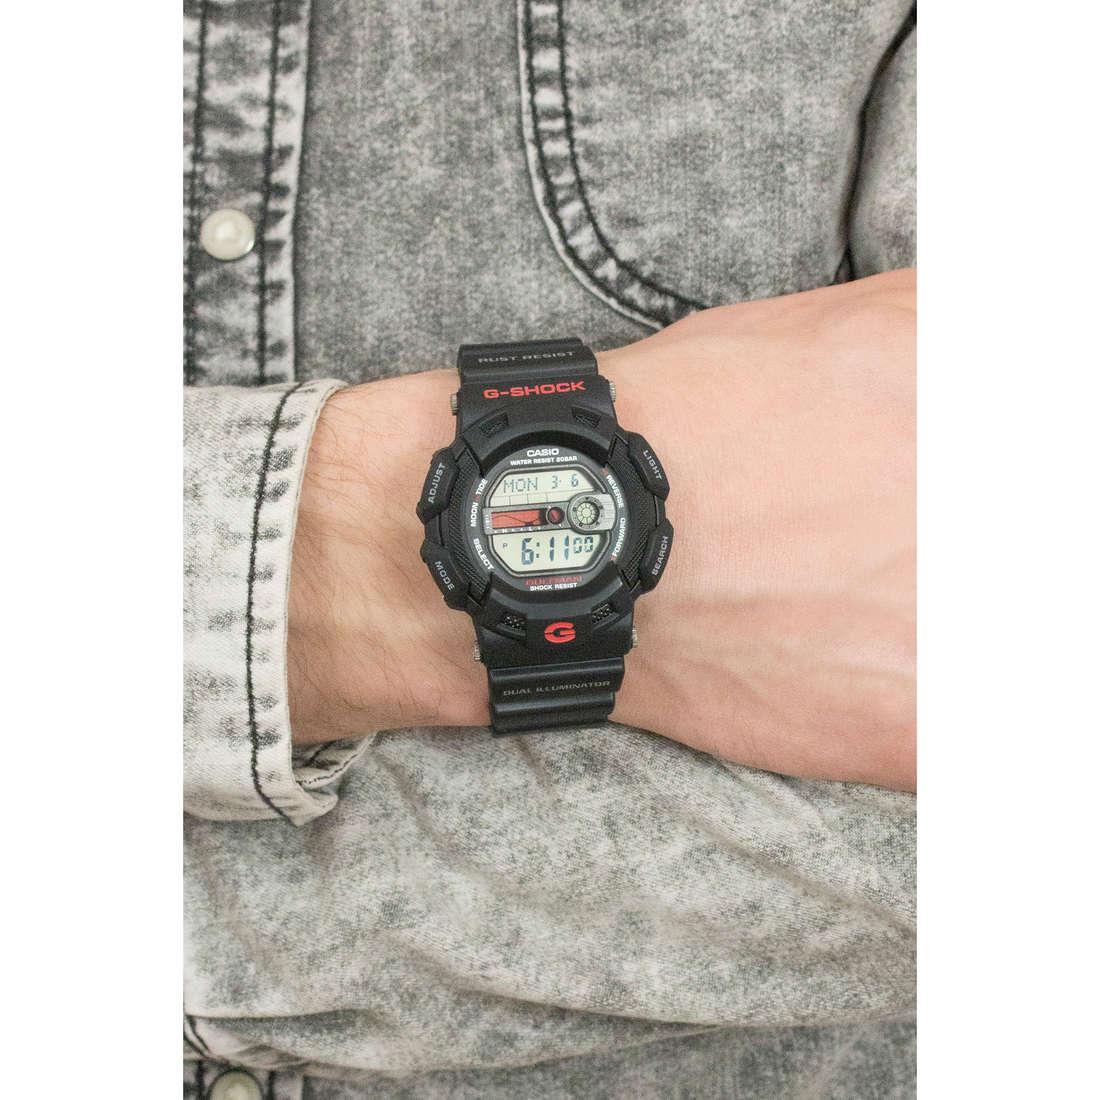 Casio digitali G-Shock uomo G-9100-1ER indosso